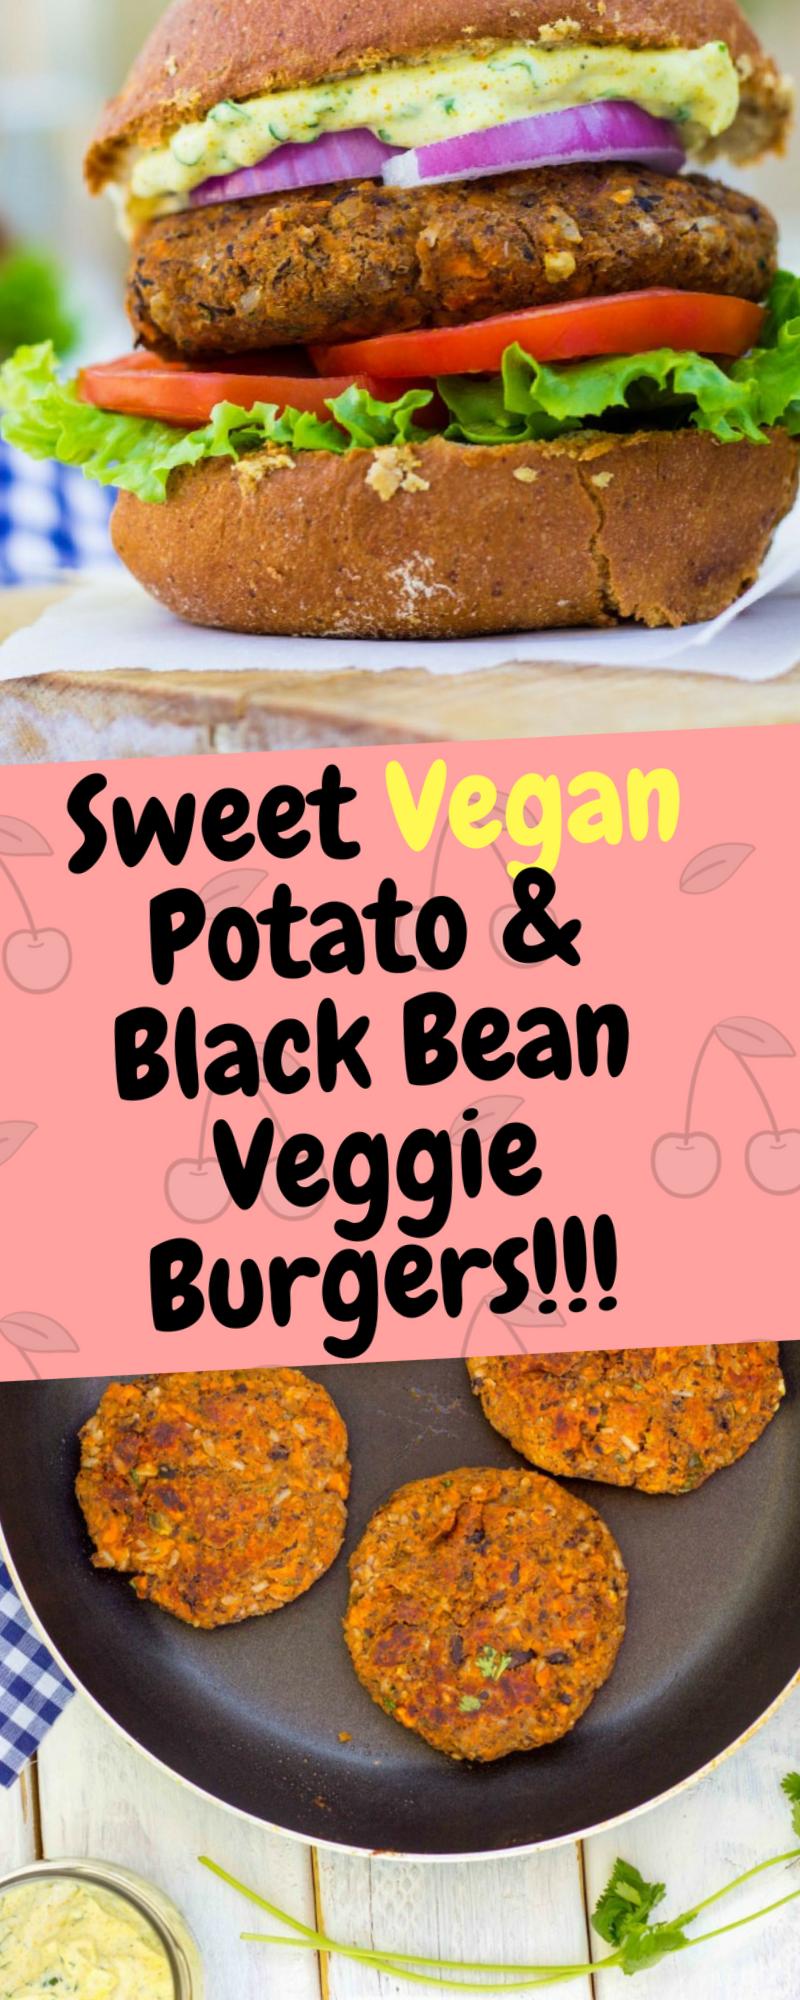 Sweet Vegan Potato Black Bean Veggie Burgers Veggie Burger Sweet Potato Burgers Vegan Veggie Burger